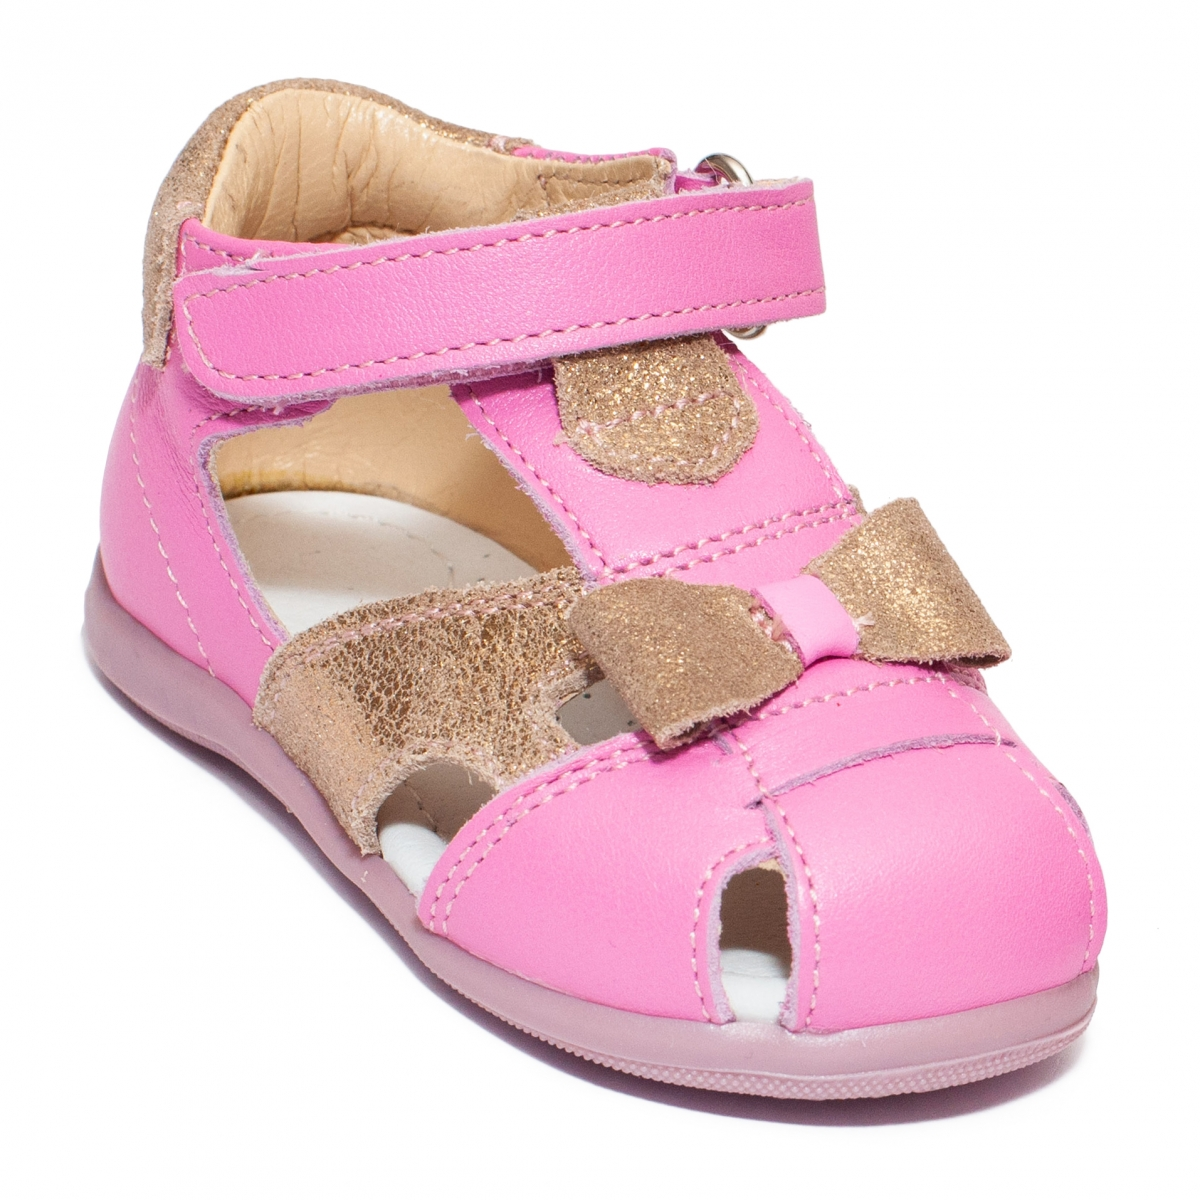 Sandalute fete avus piele 802 alb mov 18-26